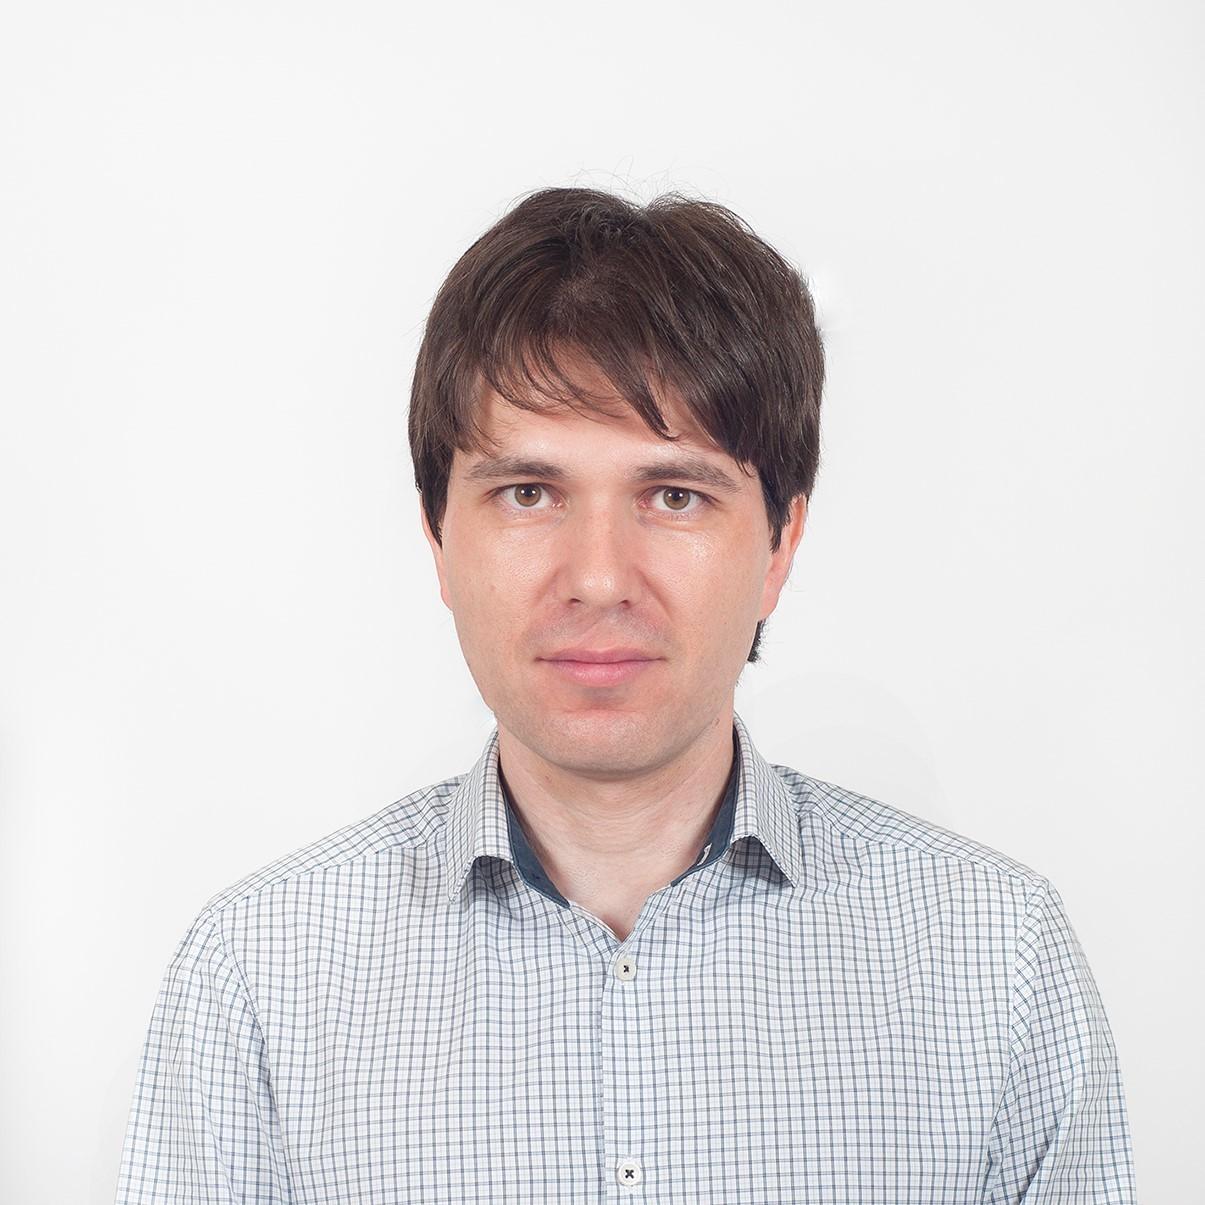 rostislav_rusev